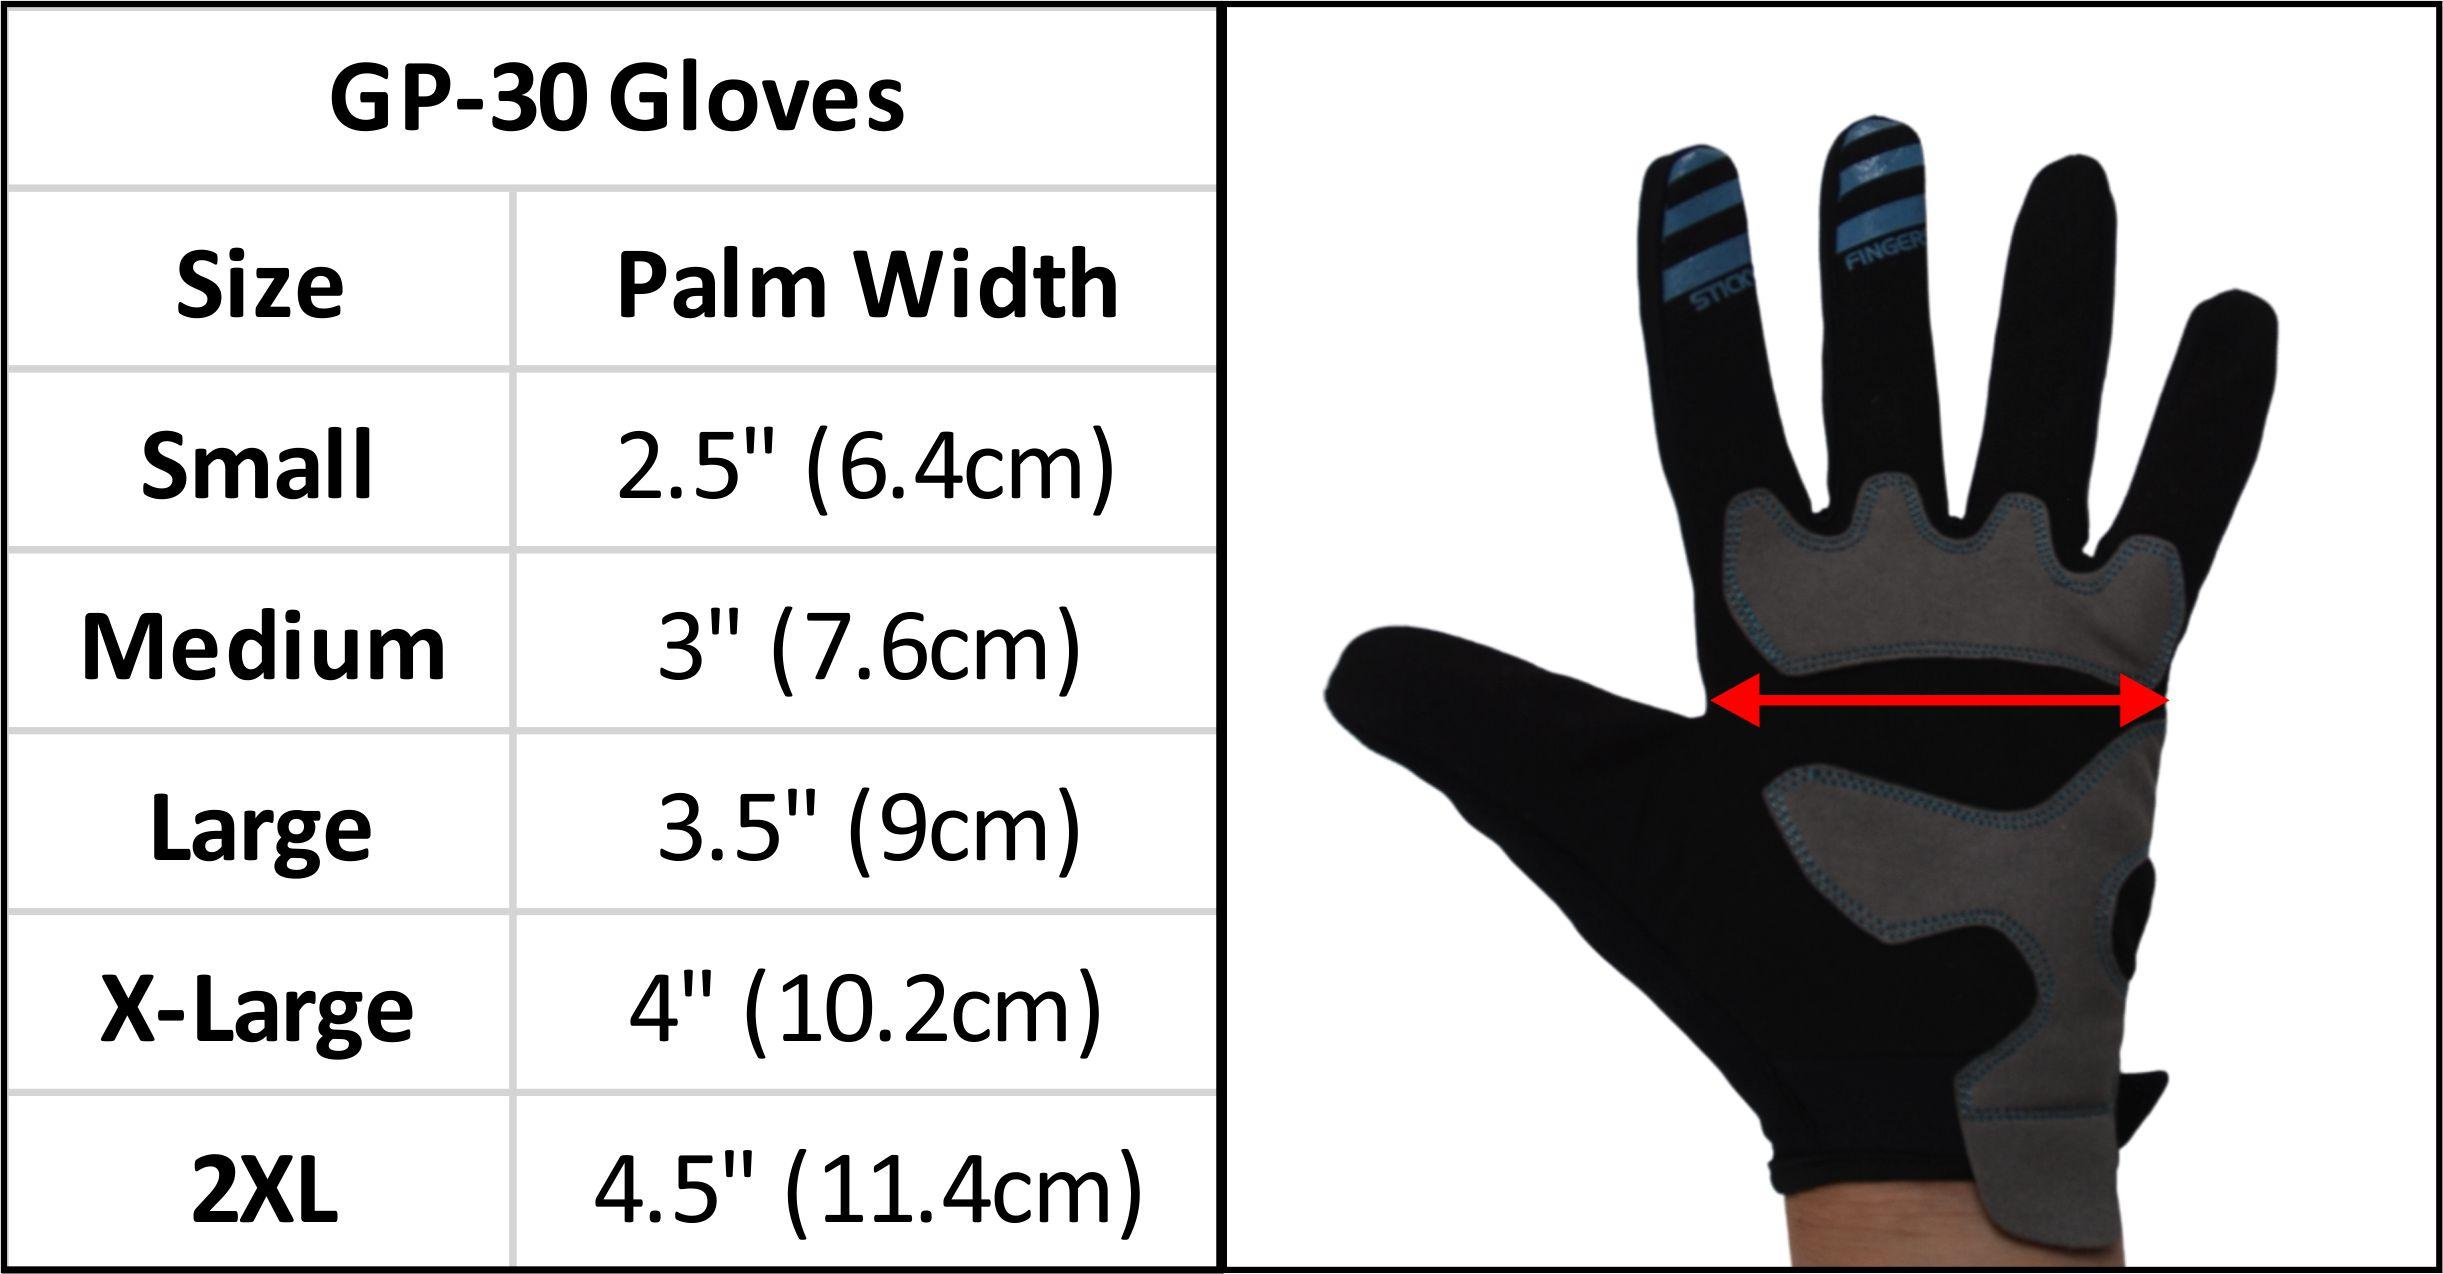 pixel-glove-size-chart.jpg